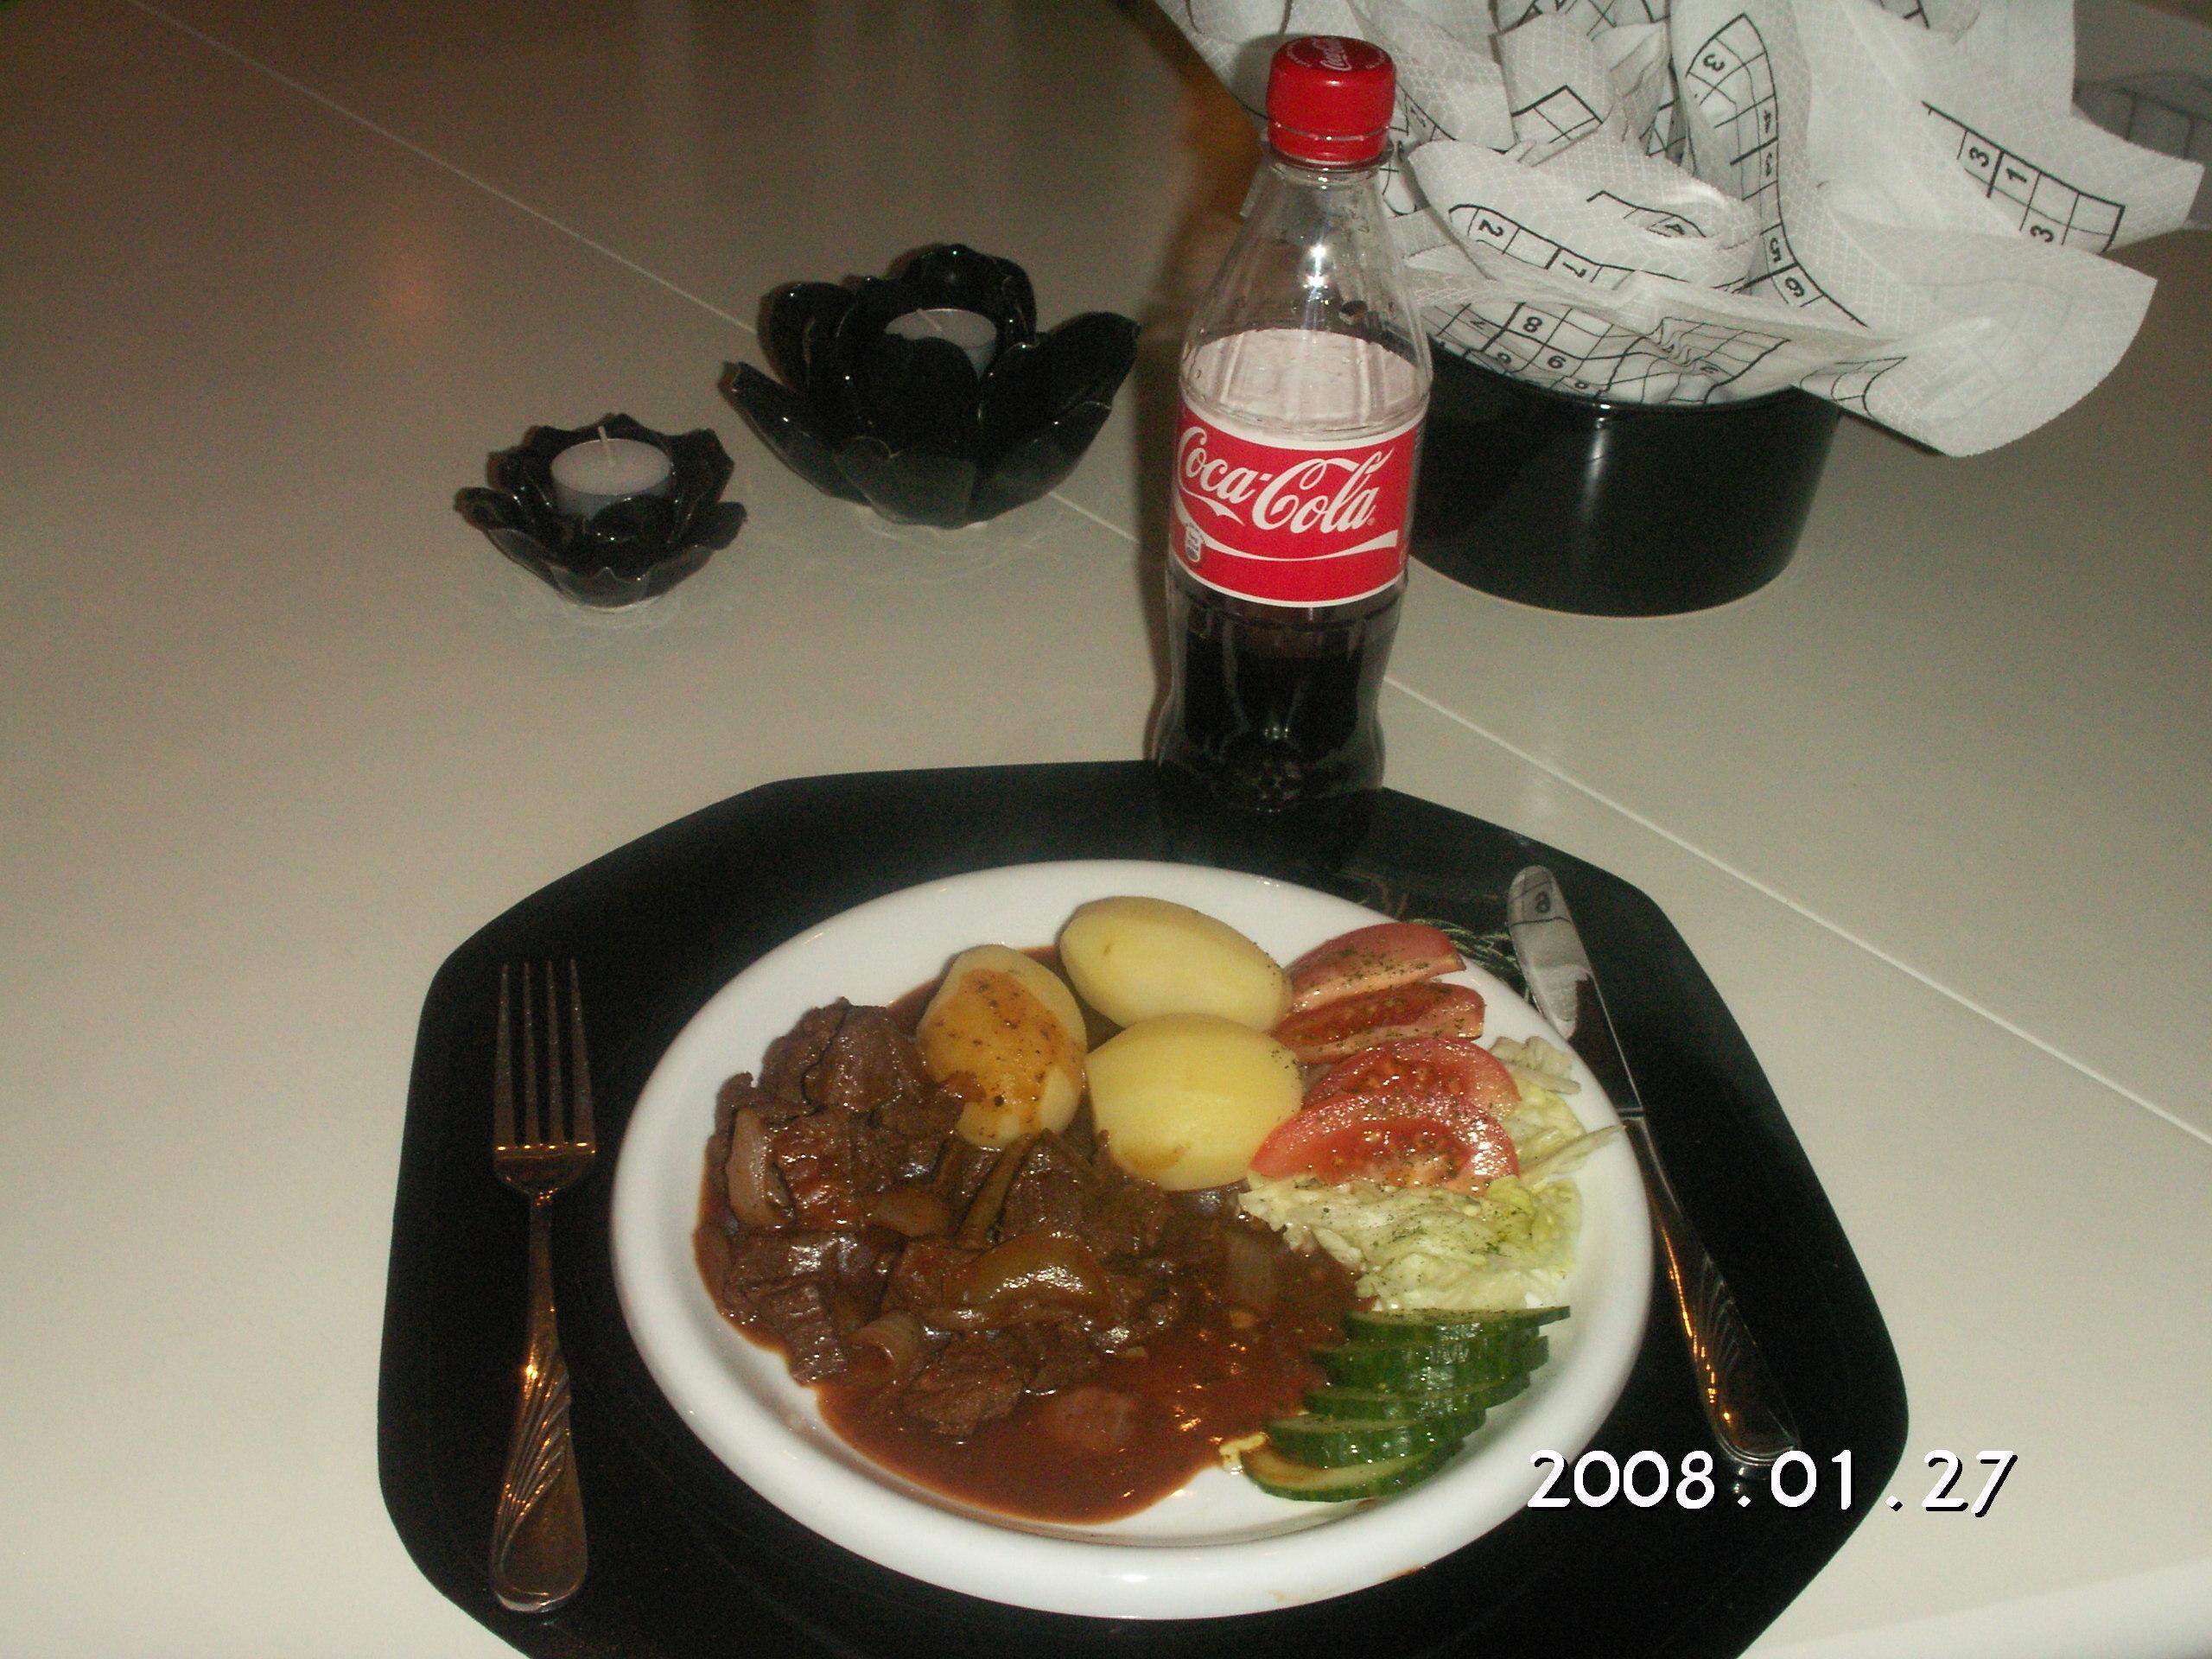 Köttgryta med Coca-Cola